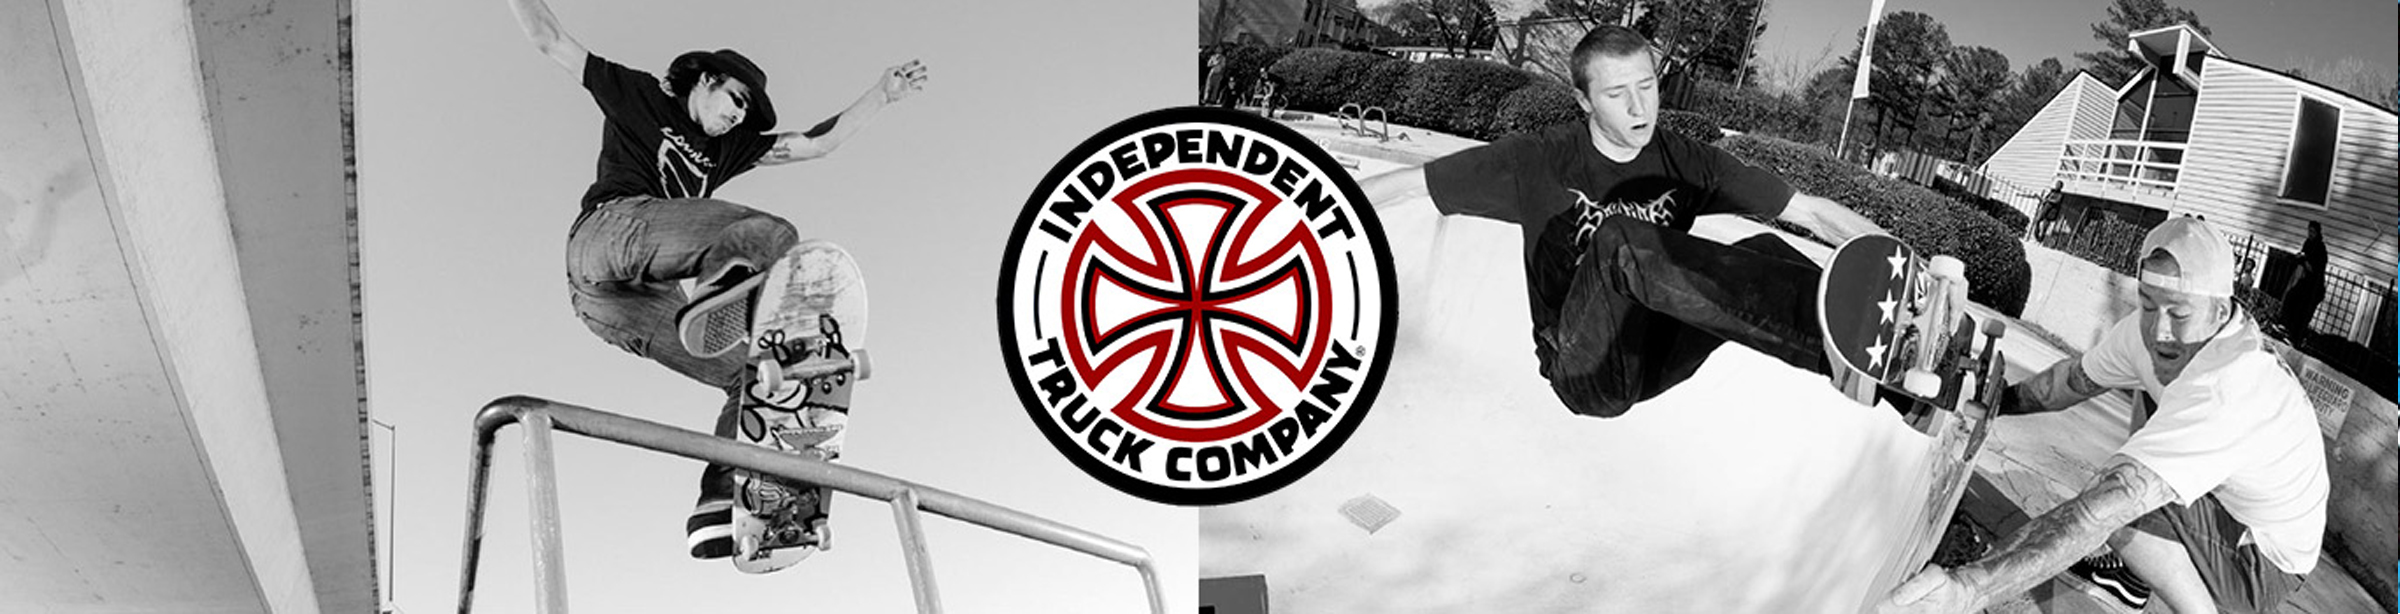 independent_IMG.jpg